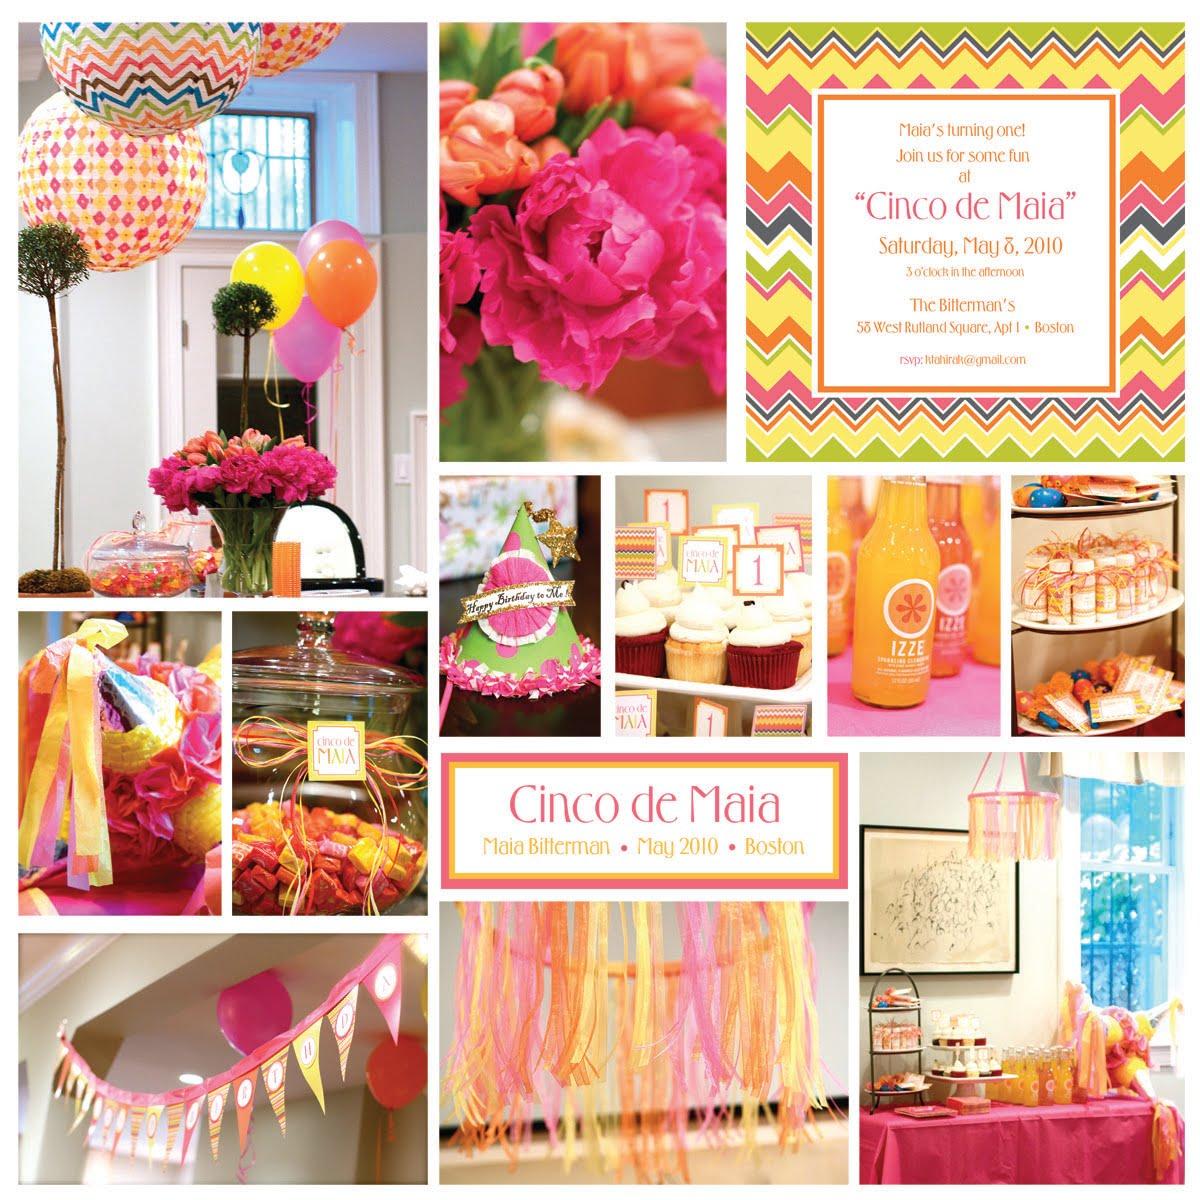 Kara S Party Ideas Cinco De Maia Mayo 1st Birthday Party